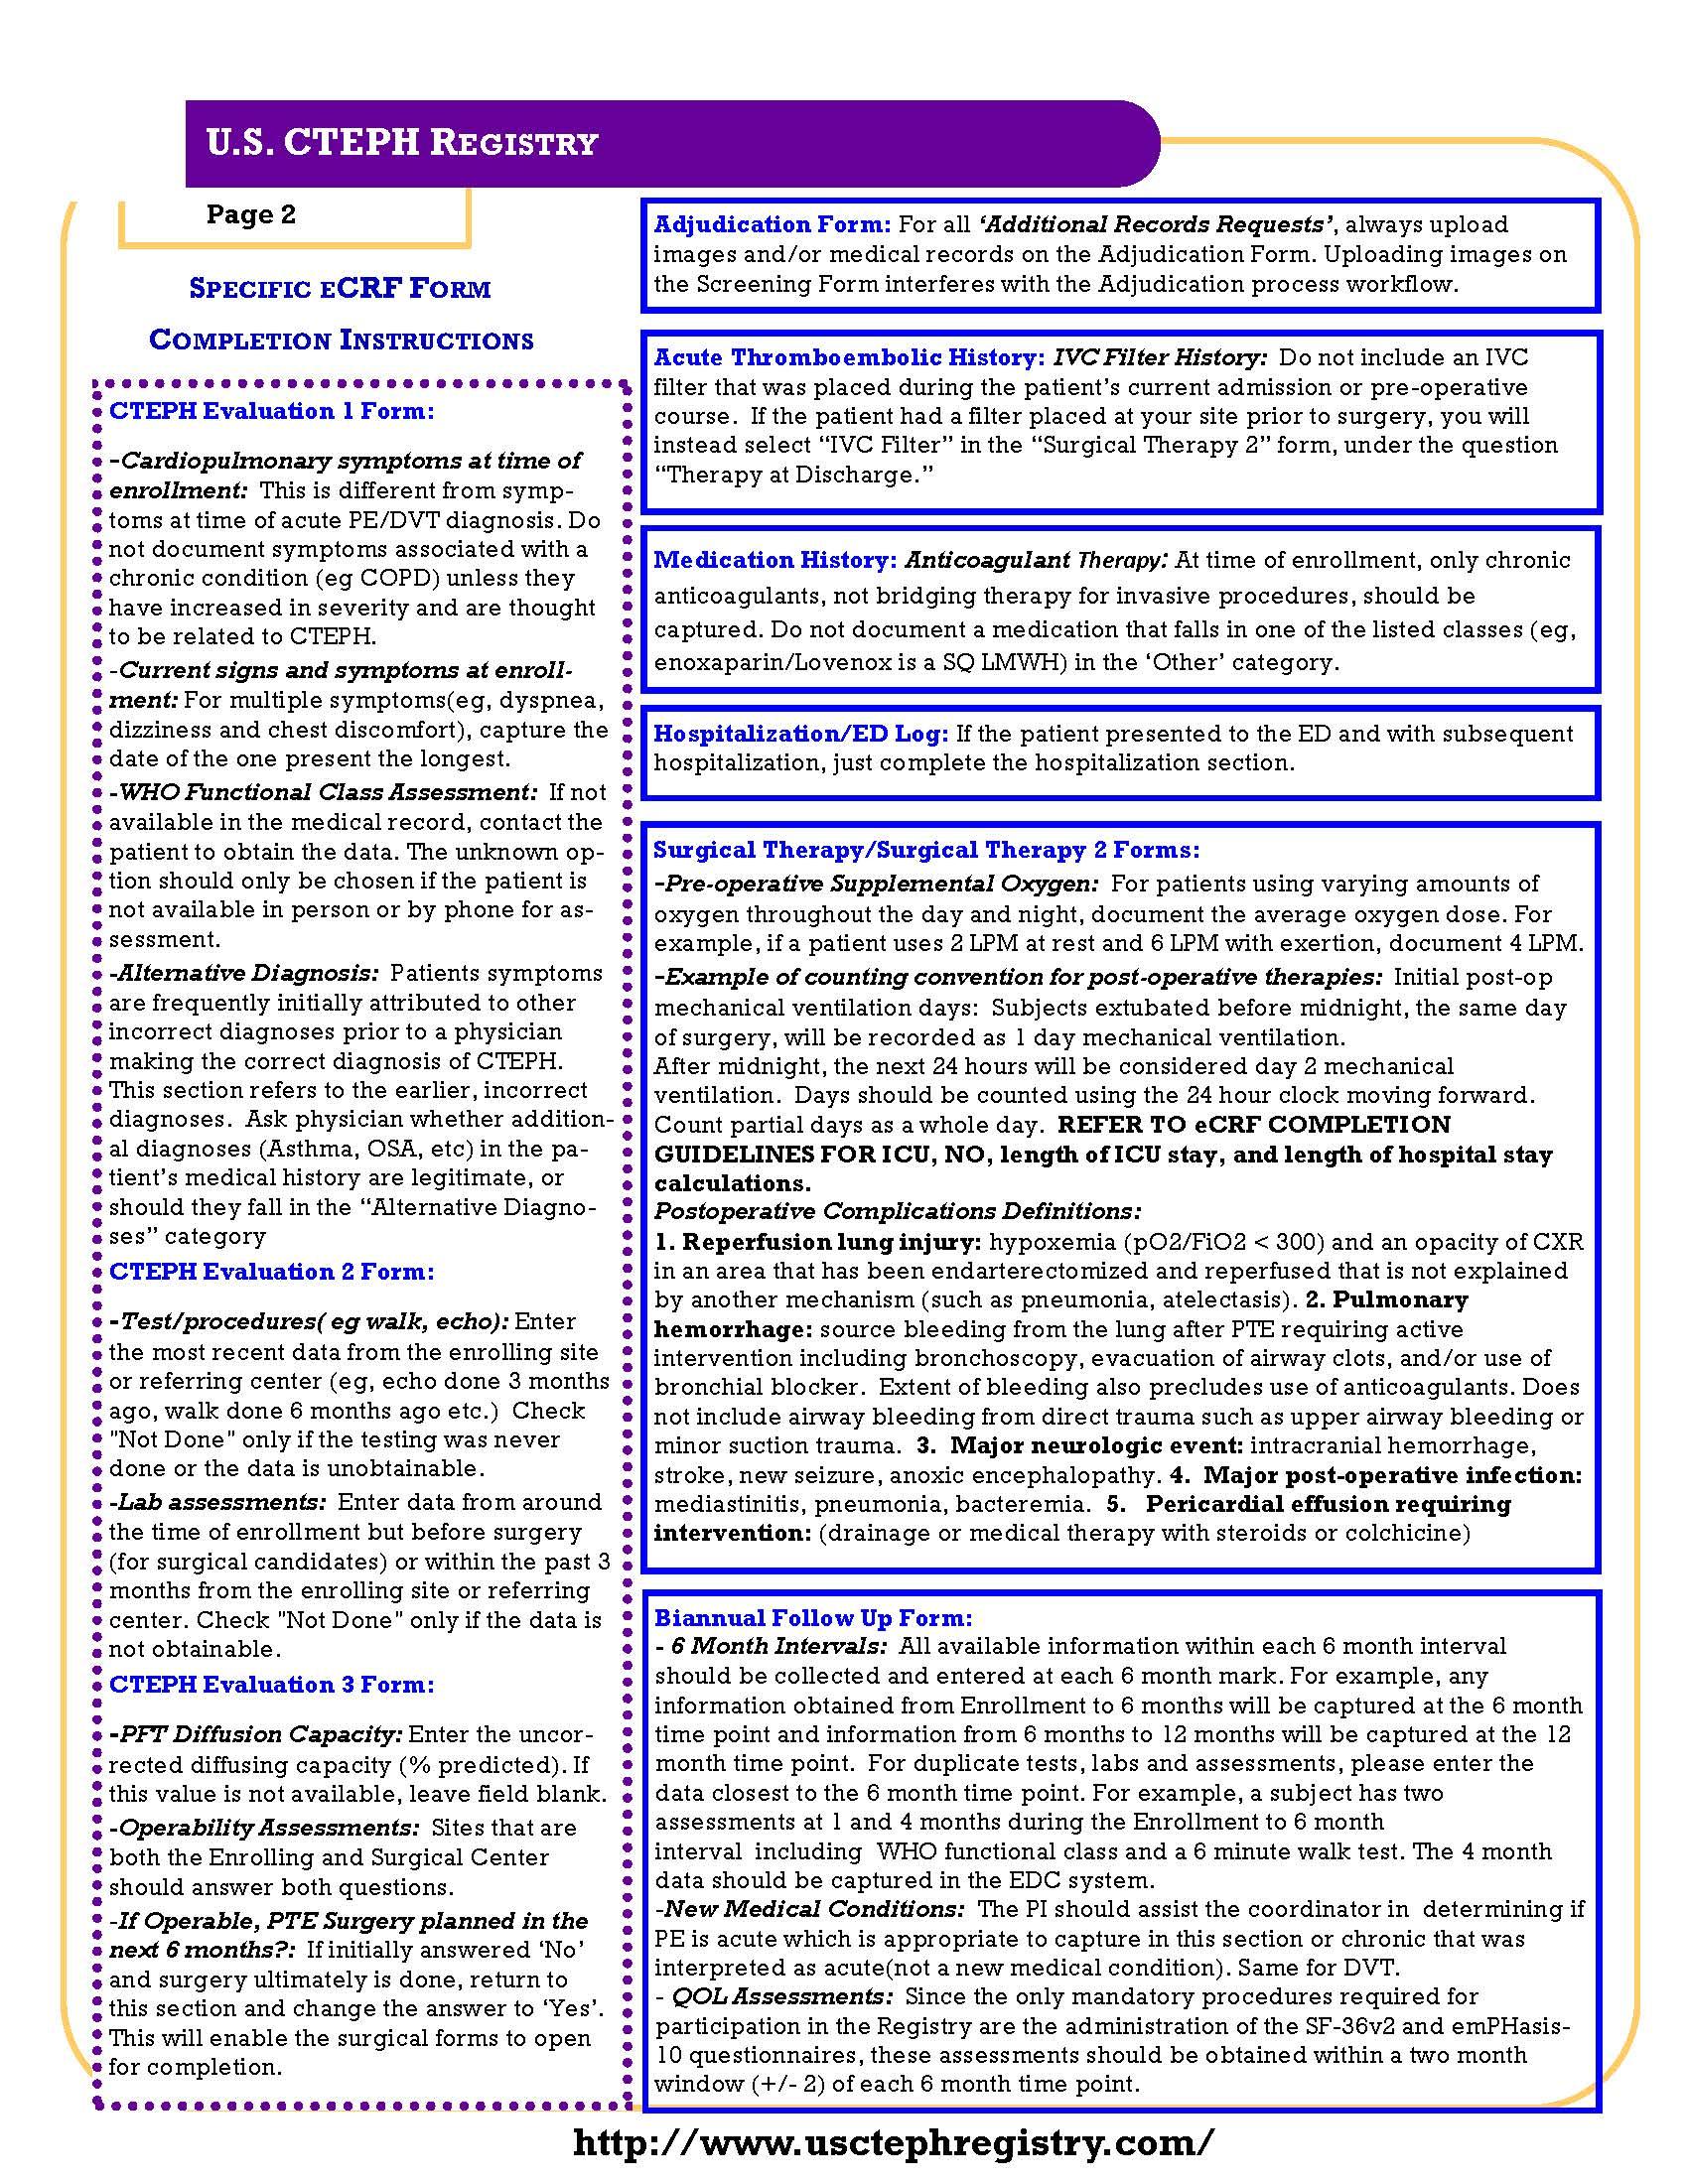 CTEPH Newsletter 3.31.2016_Page_2.jpg